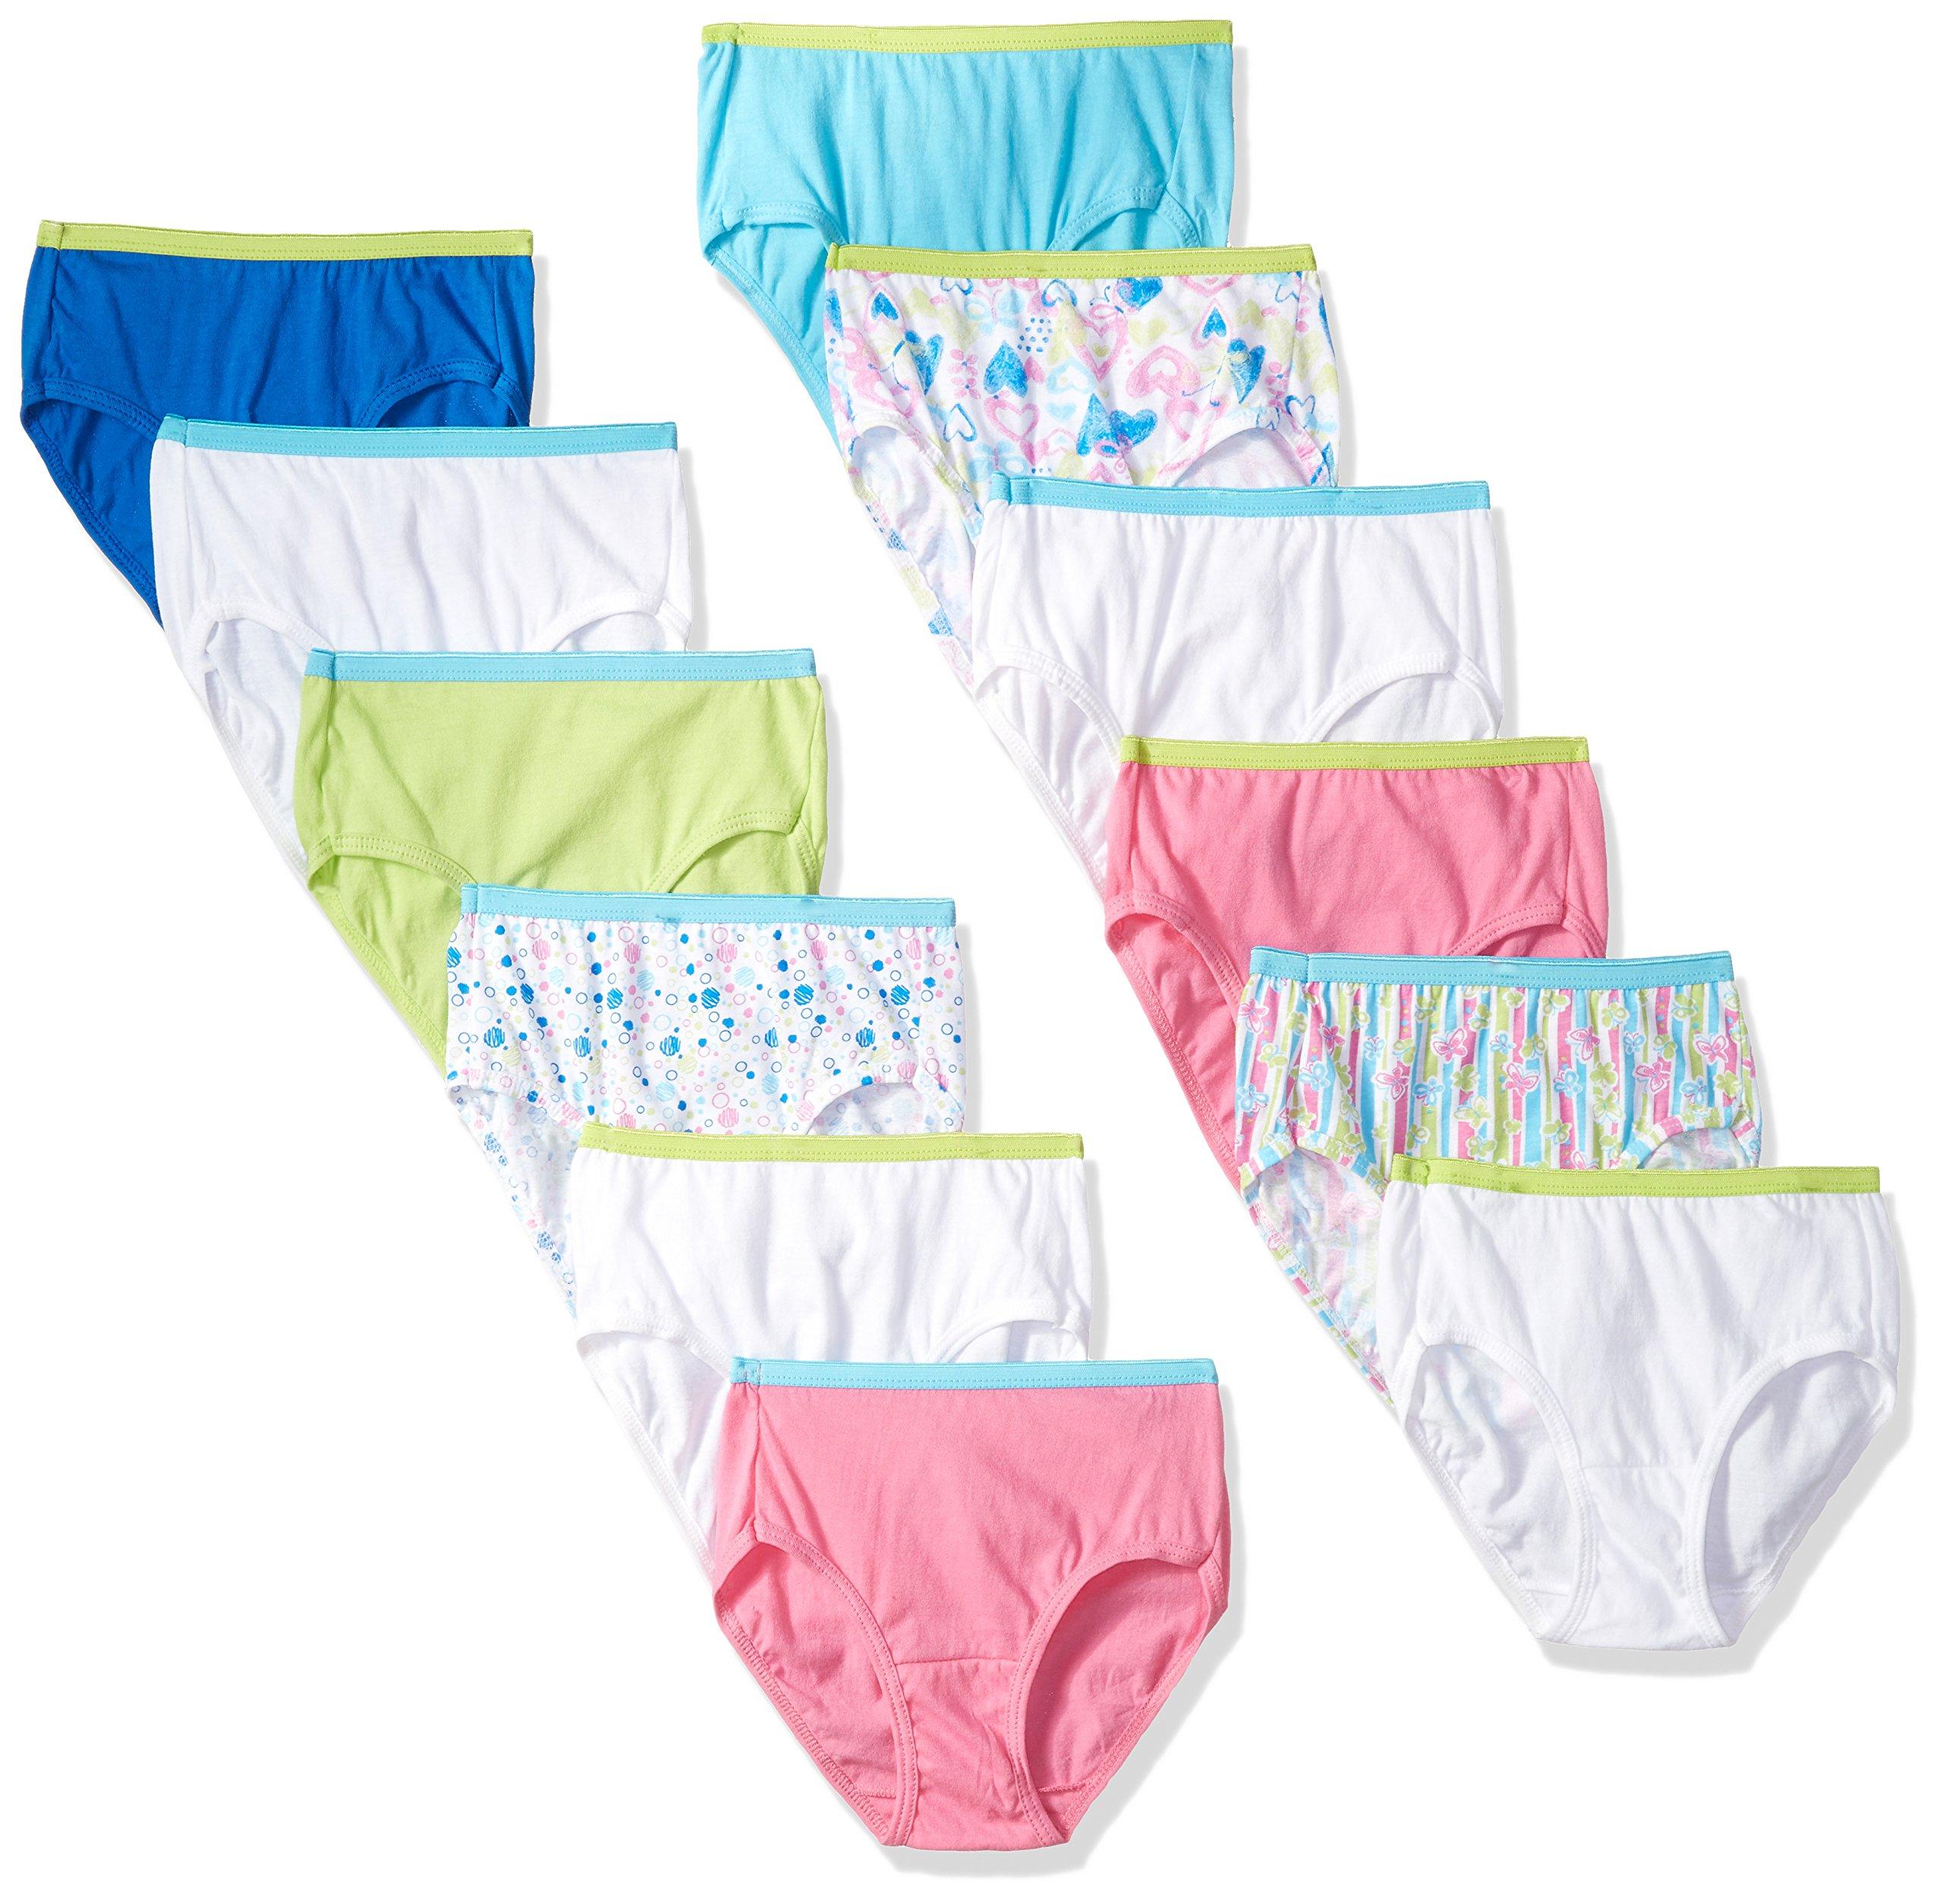 Hanes Big Girls' Tagless Cotton Briefs 12-Pack, Assorted, 10